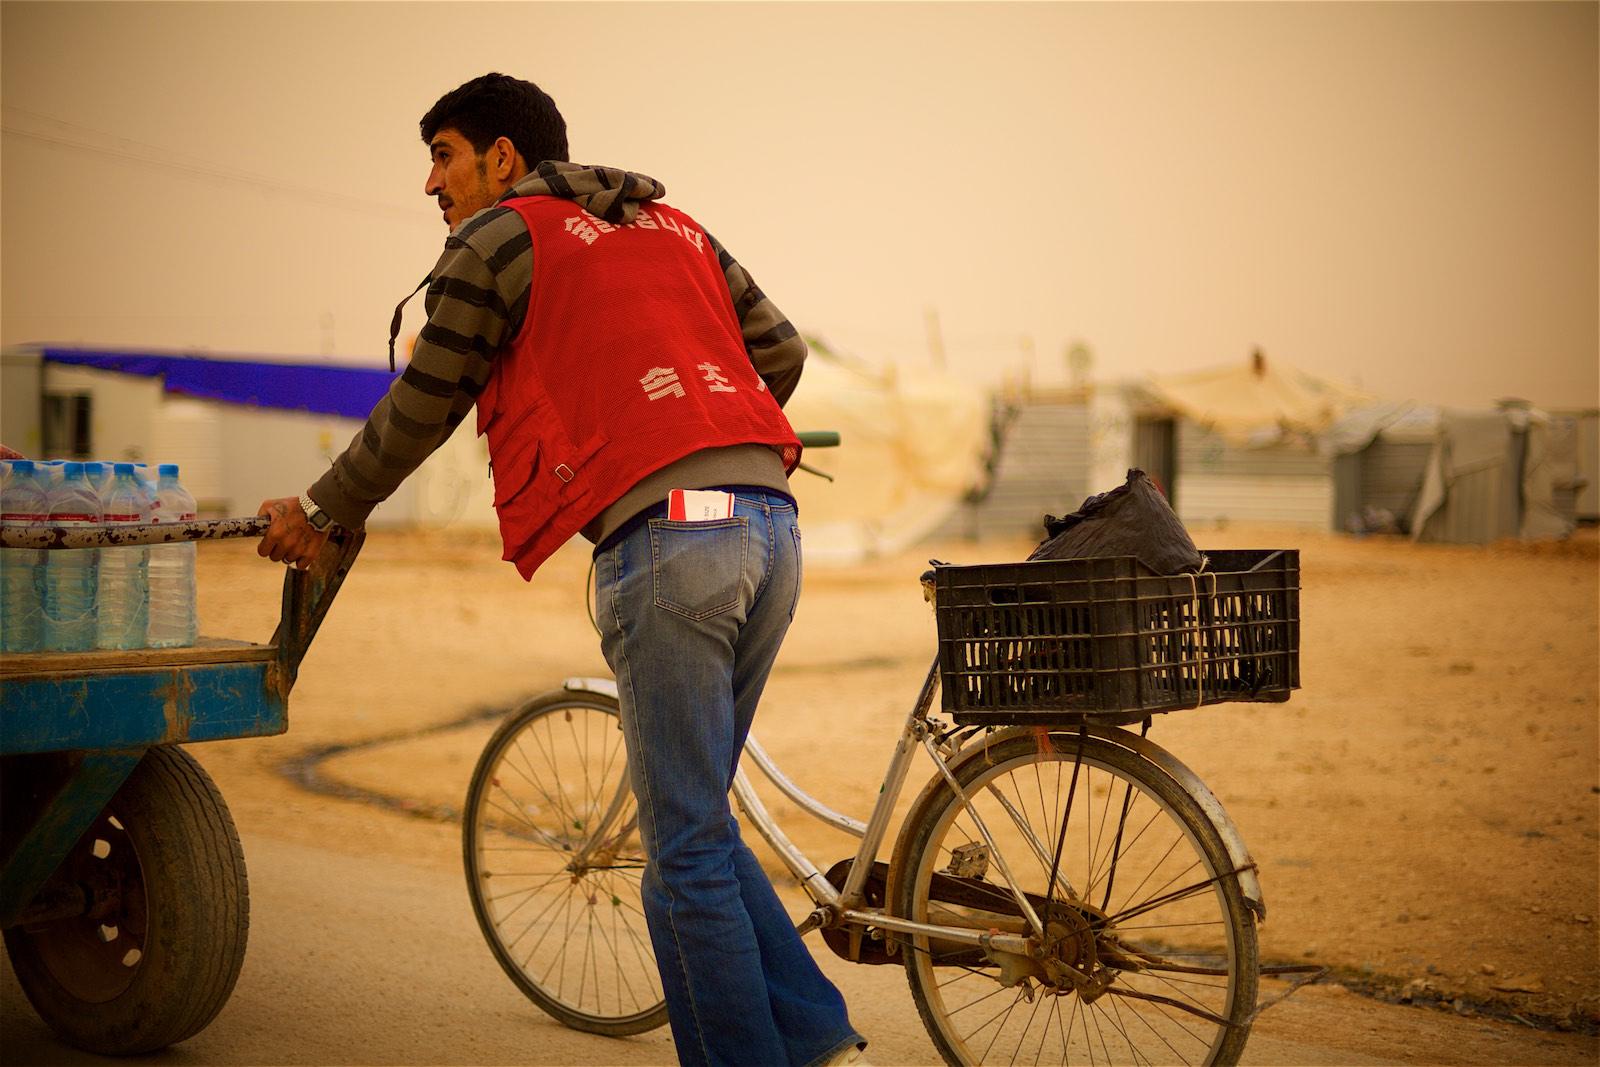 denis-bosnic-zaatari-jordan-refugee-camp-3.jpg